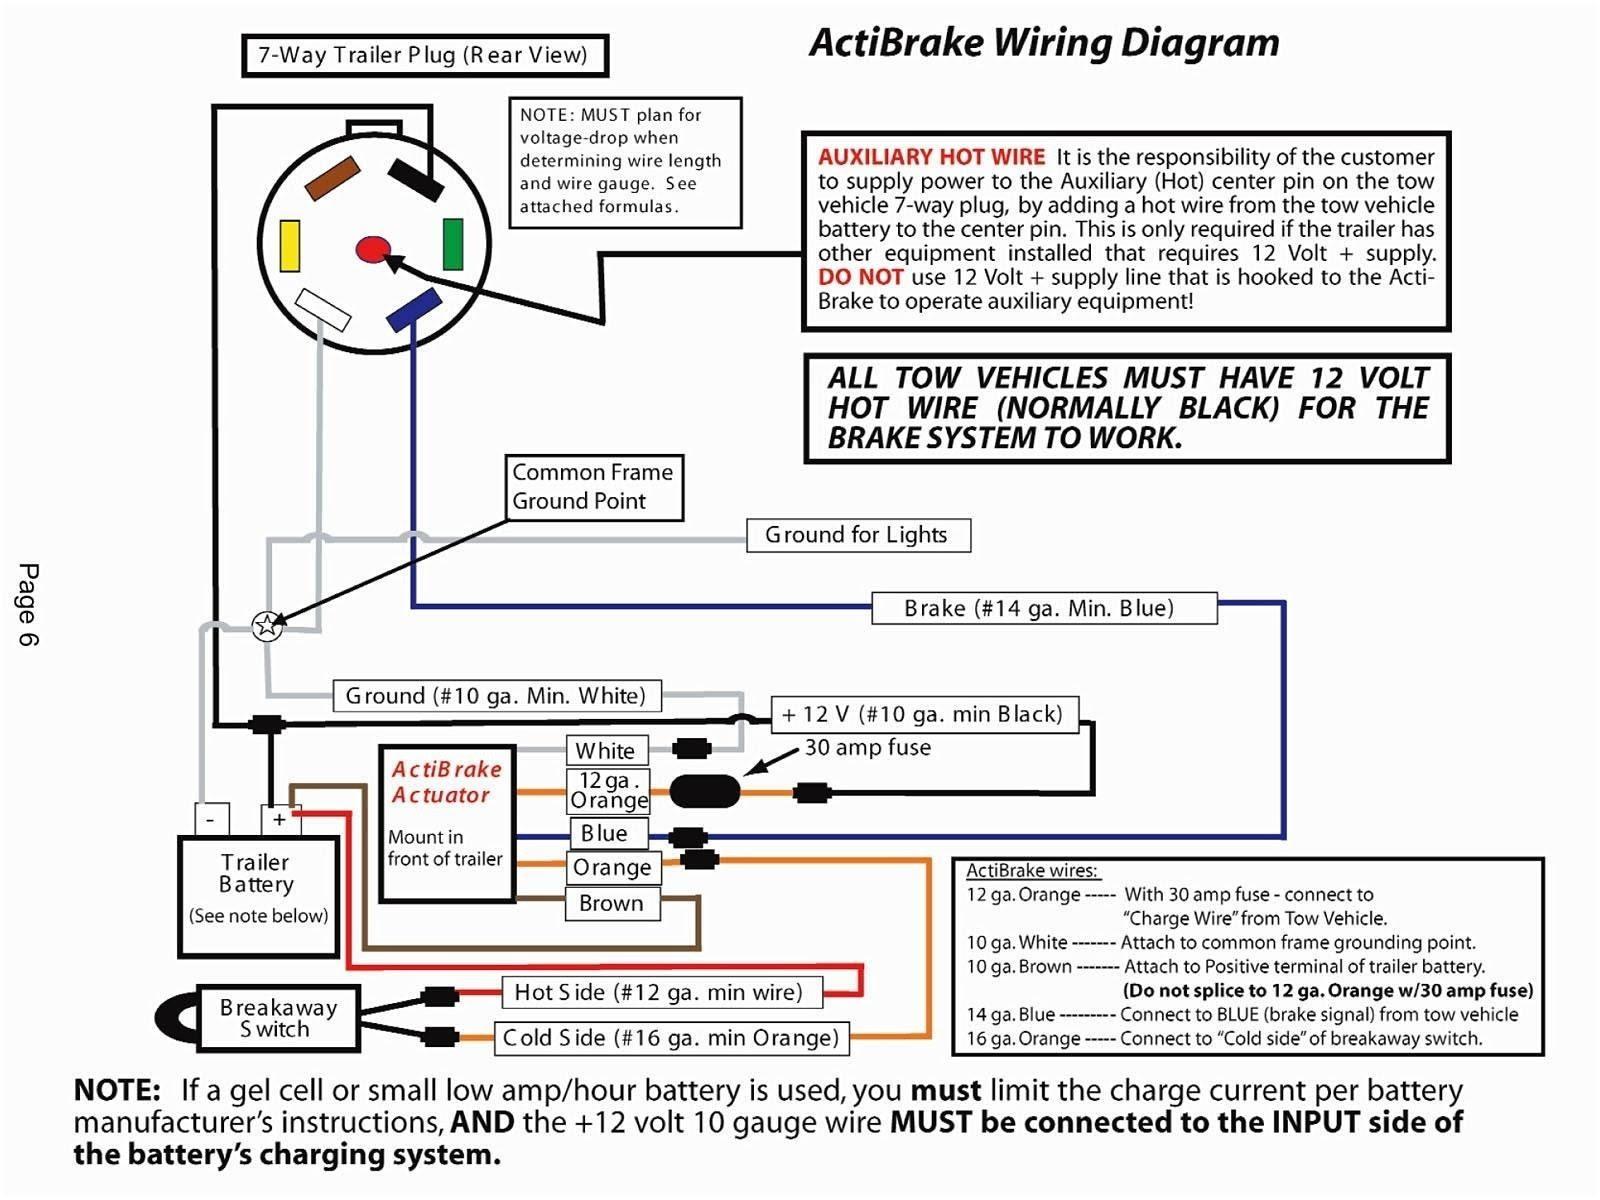 2008 Chevy Silverado Trailer Light Wiring Diagram from lh5.googleusercontent.com